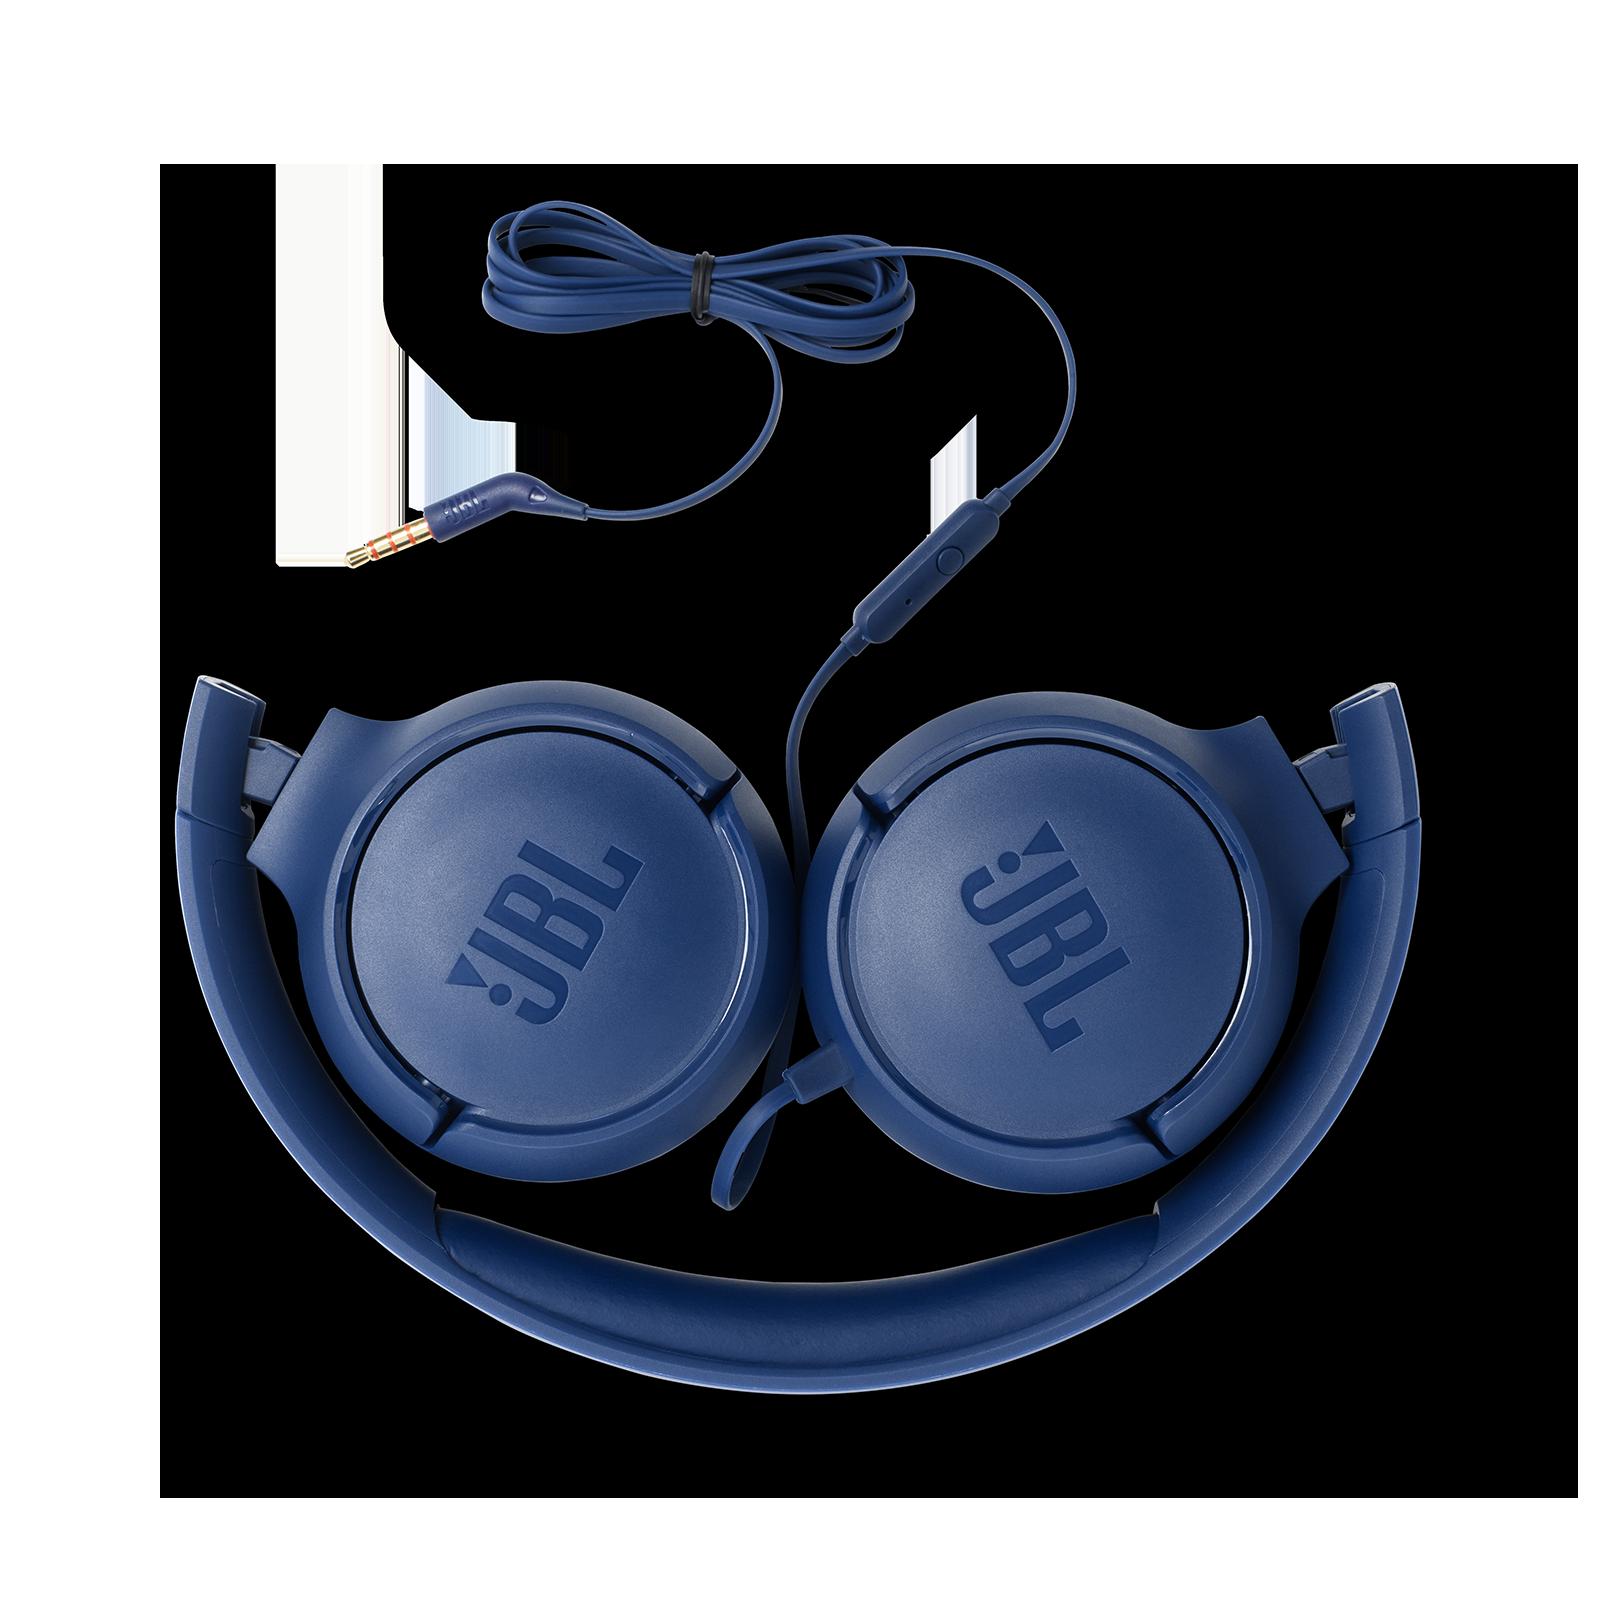 JBL TUNE 500 - Blue - Wired on-ear headphones - Detailshot 1